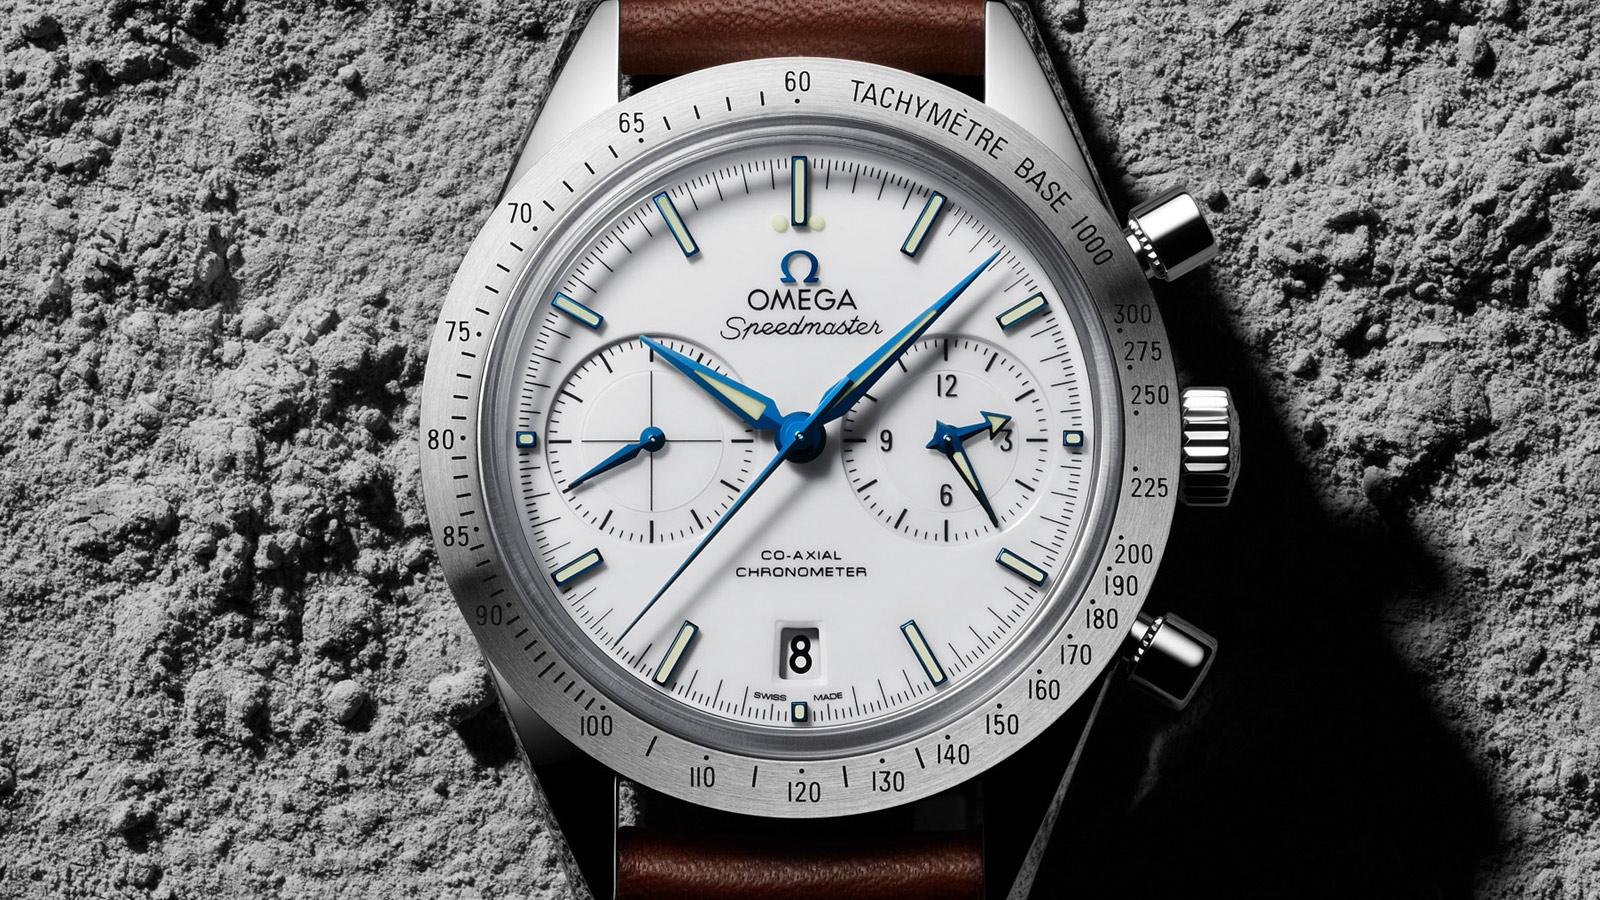 OMEGA-Speedmaster-Ref-331-92-42-51-04-001-1.jpg